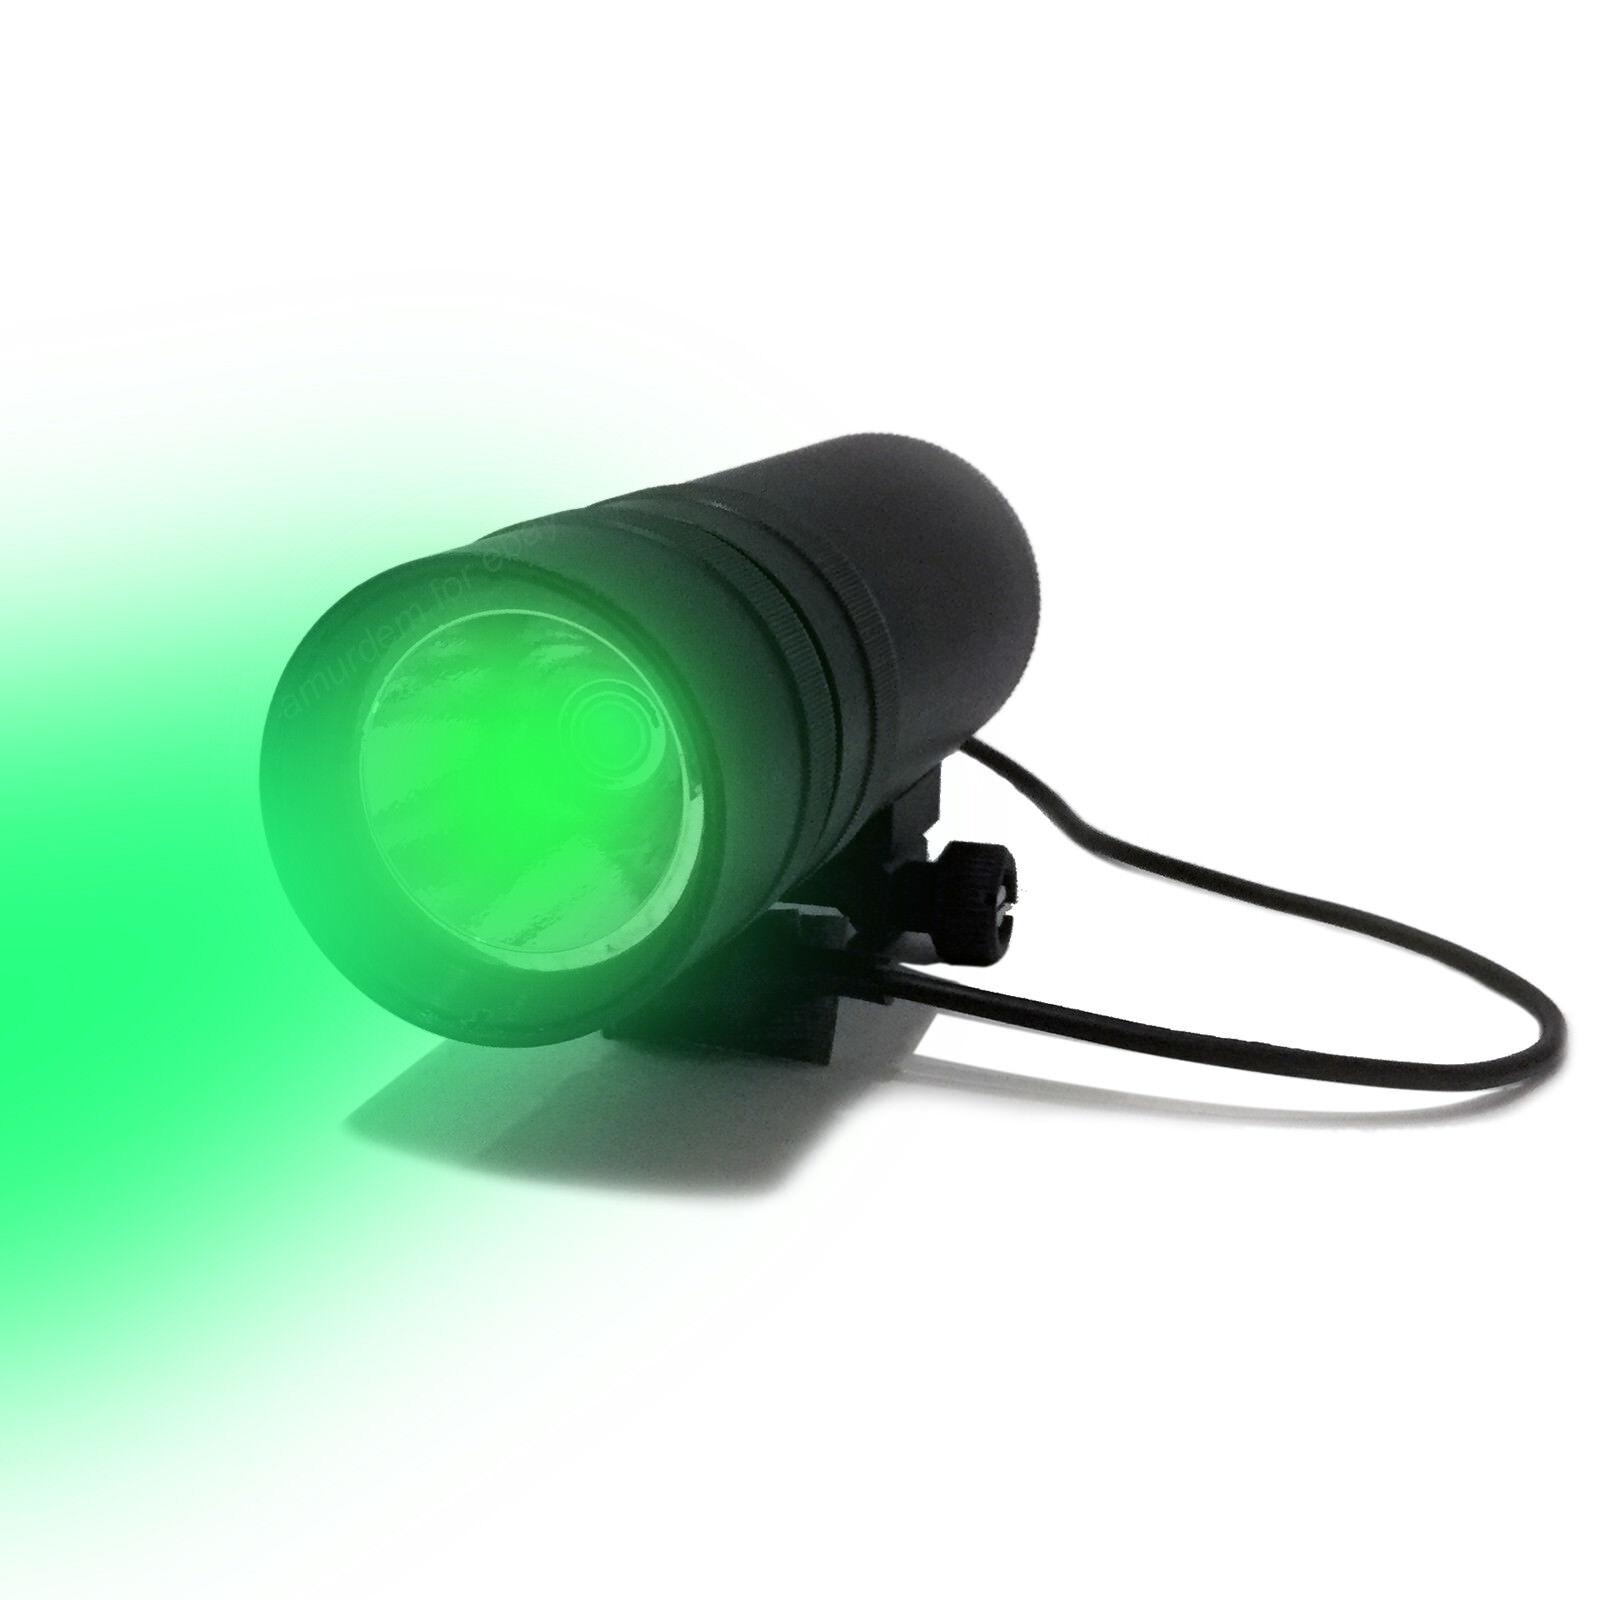 Zenit FOT-2C Weaver Mount Tactical Flashlight. White Green Light.